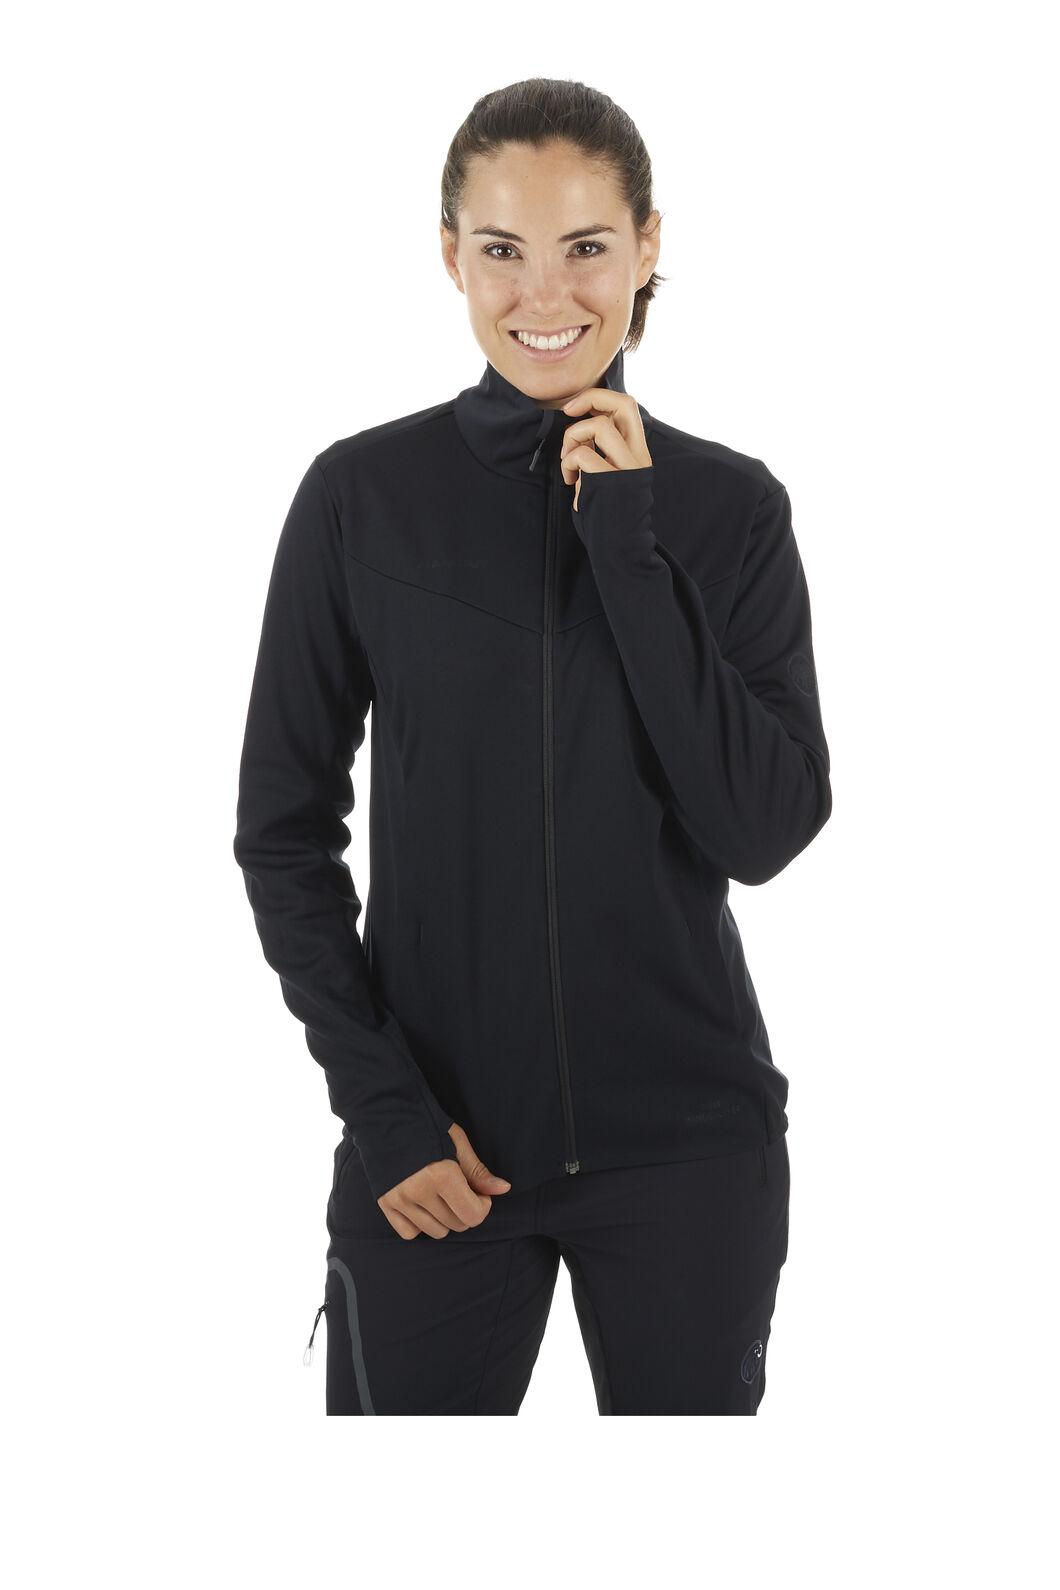 Mammut Ultimate V Softshell Jacket - Women's, Black/Black, hi-res